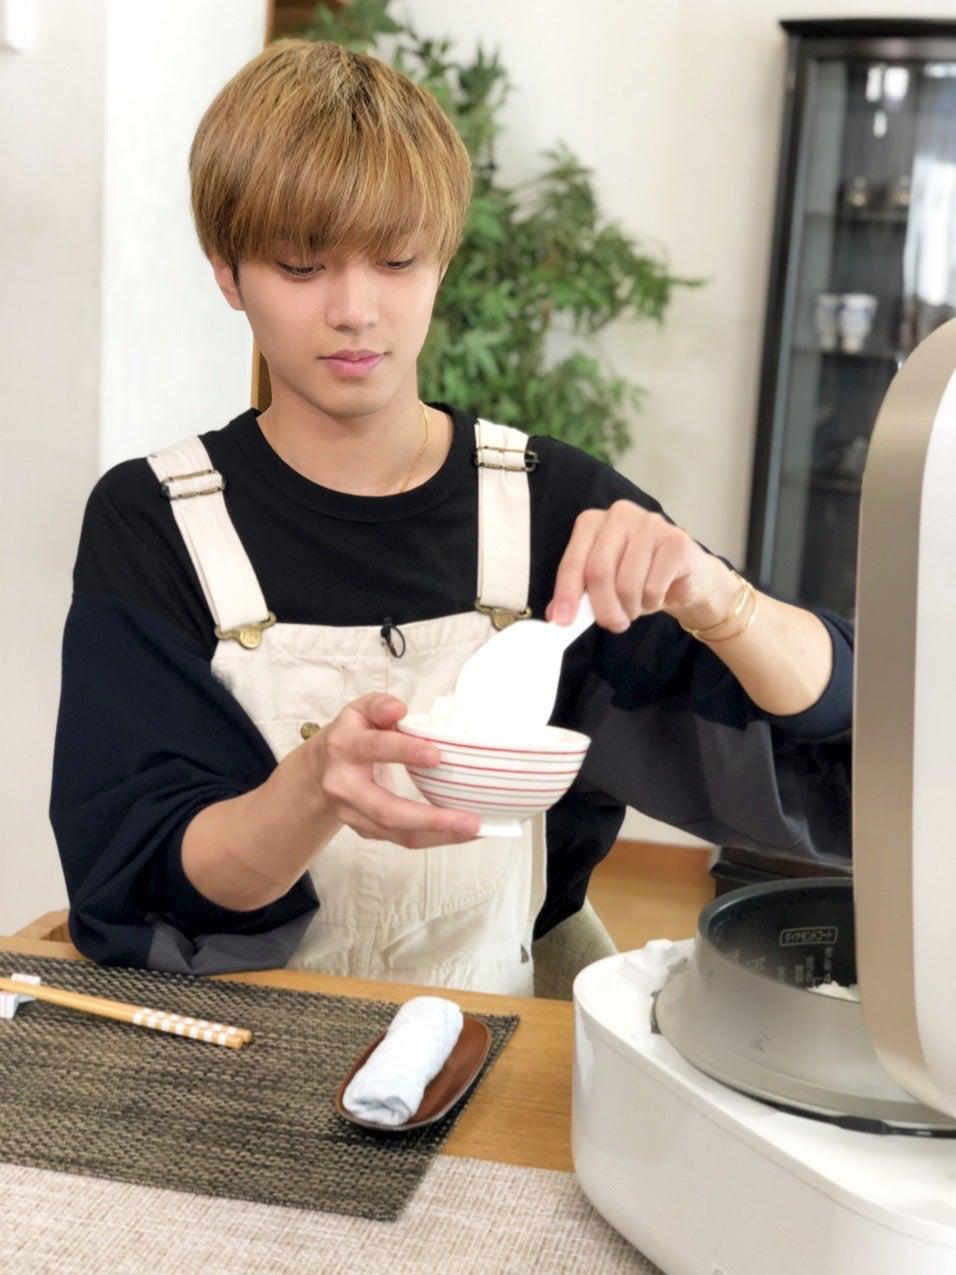 King & Prince永瀬廉、お茶碗6杯分を完食 美味しい炊き方のコツを披露